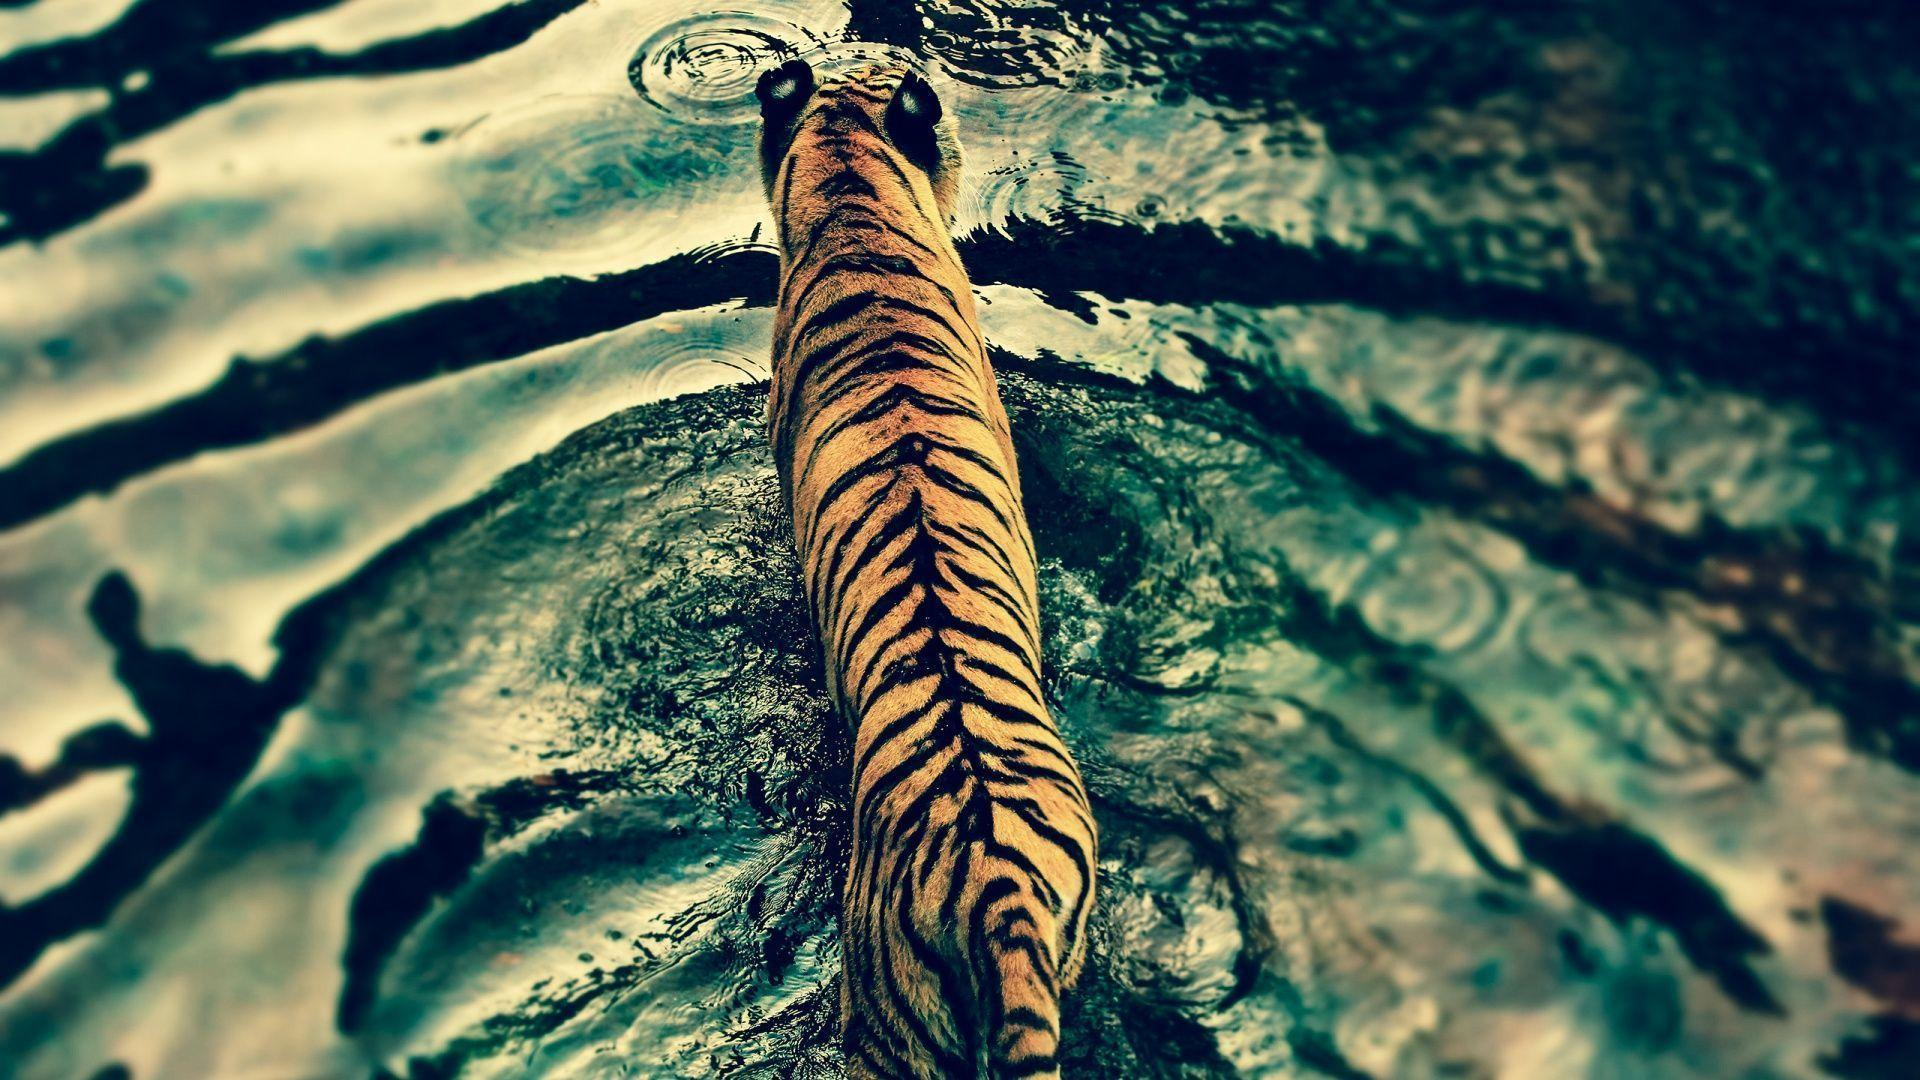 Tiger Wallpaper Windows Seven #10851 Wallpaper   Cool ...